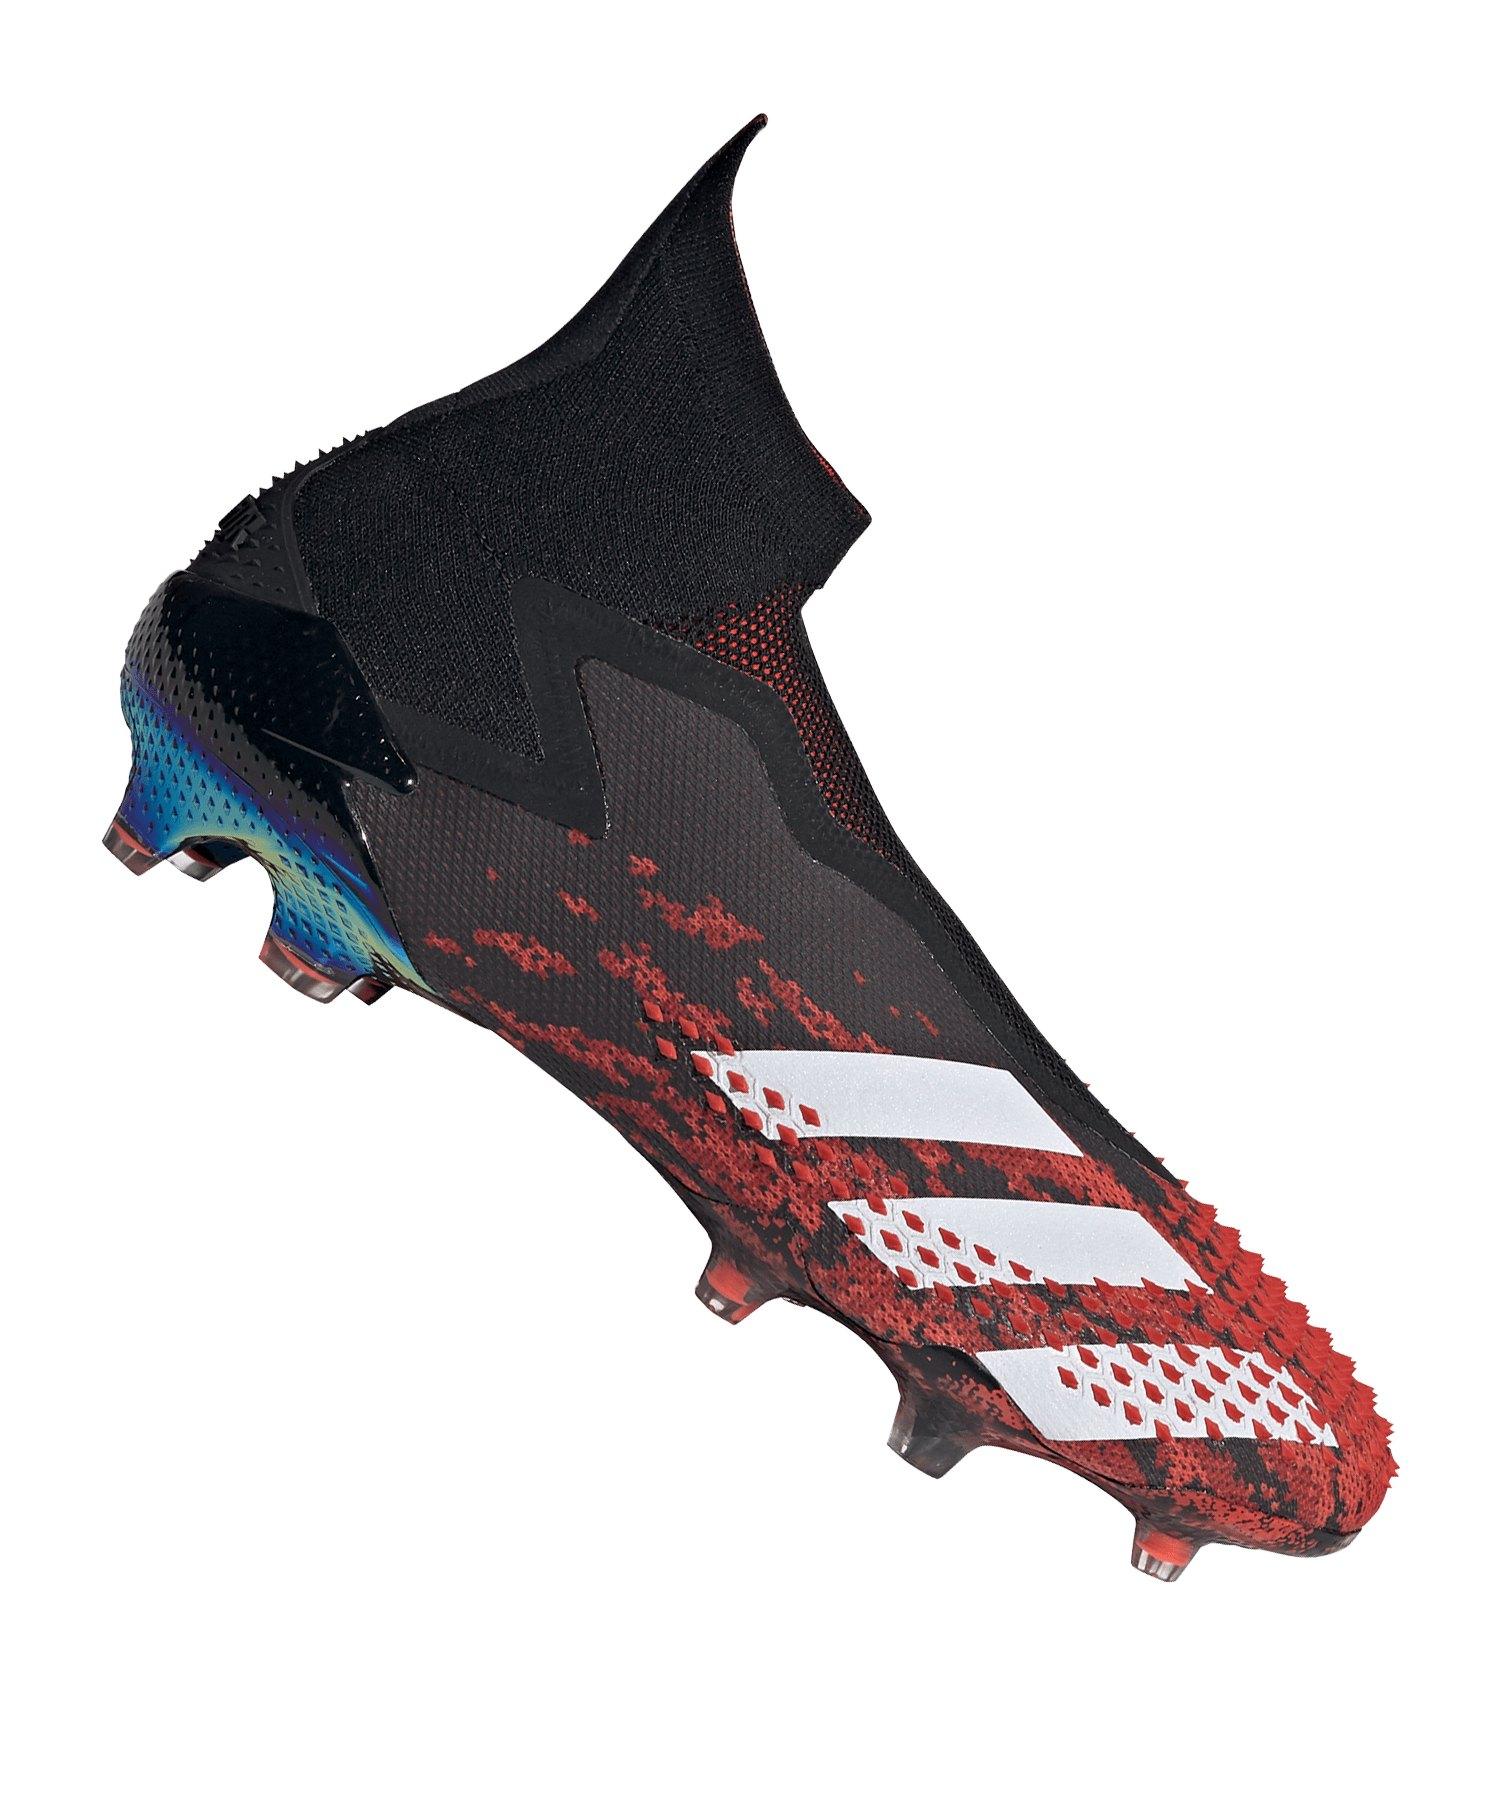 adidas Predator 20+ FG Schwarz Rot - schwarz